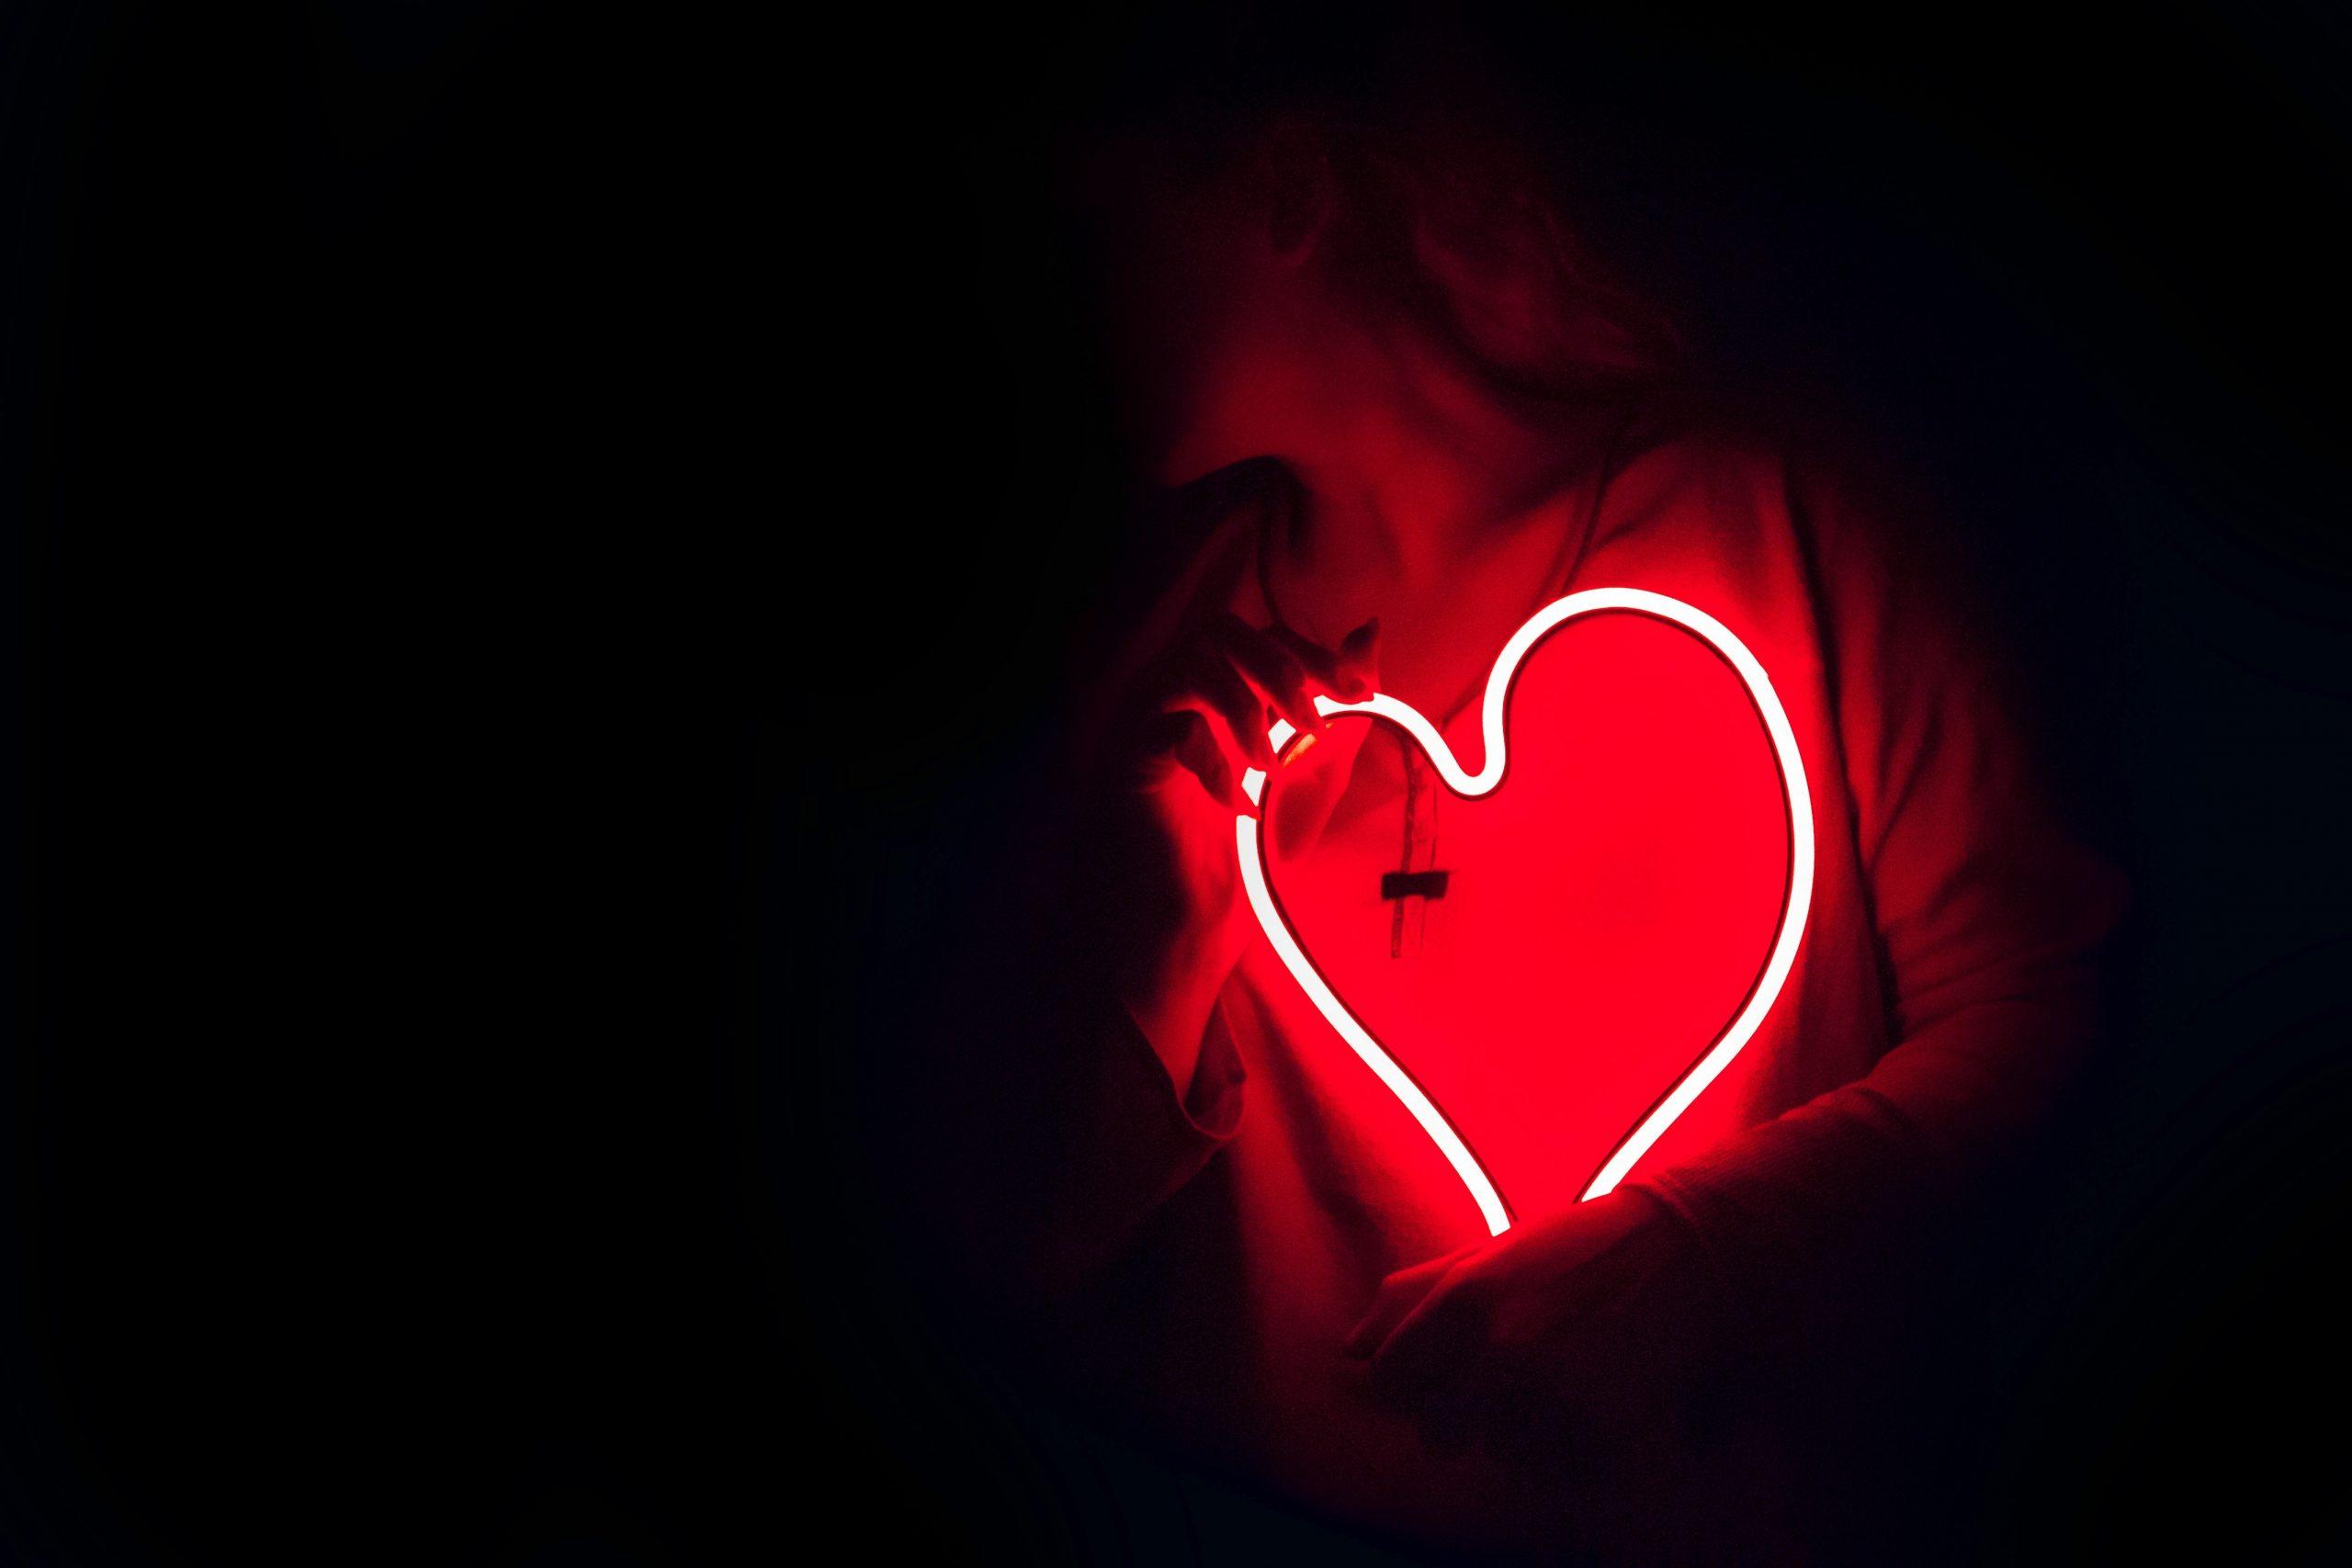 Neon heart; reducing your risk of heart disease